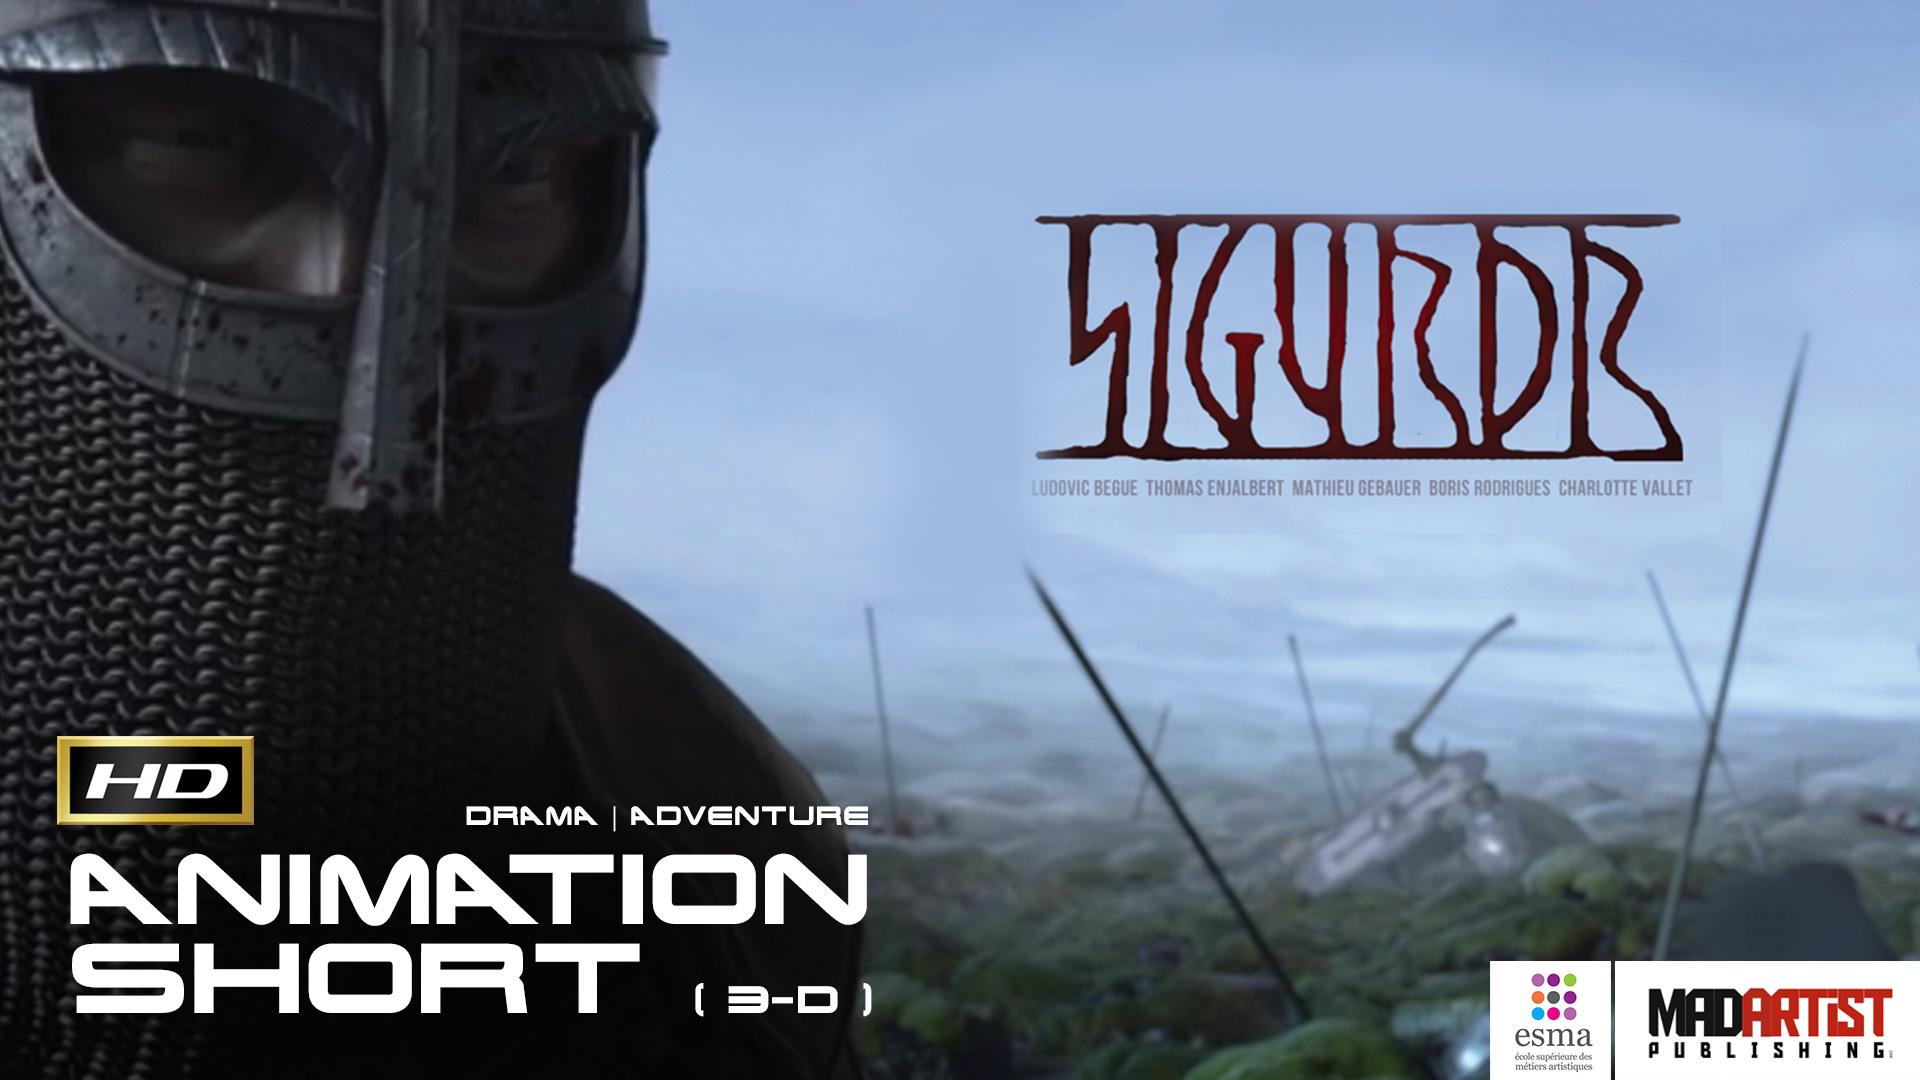 SIGURDR HD Brilliant Viking Tale CGI 3D Animated